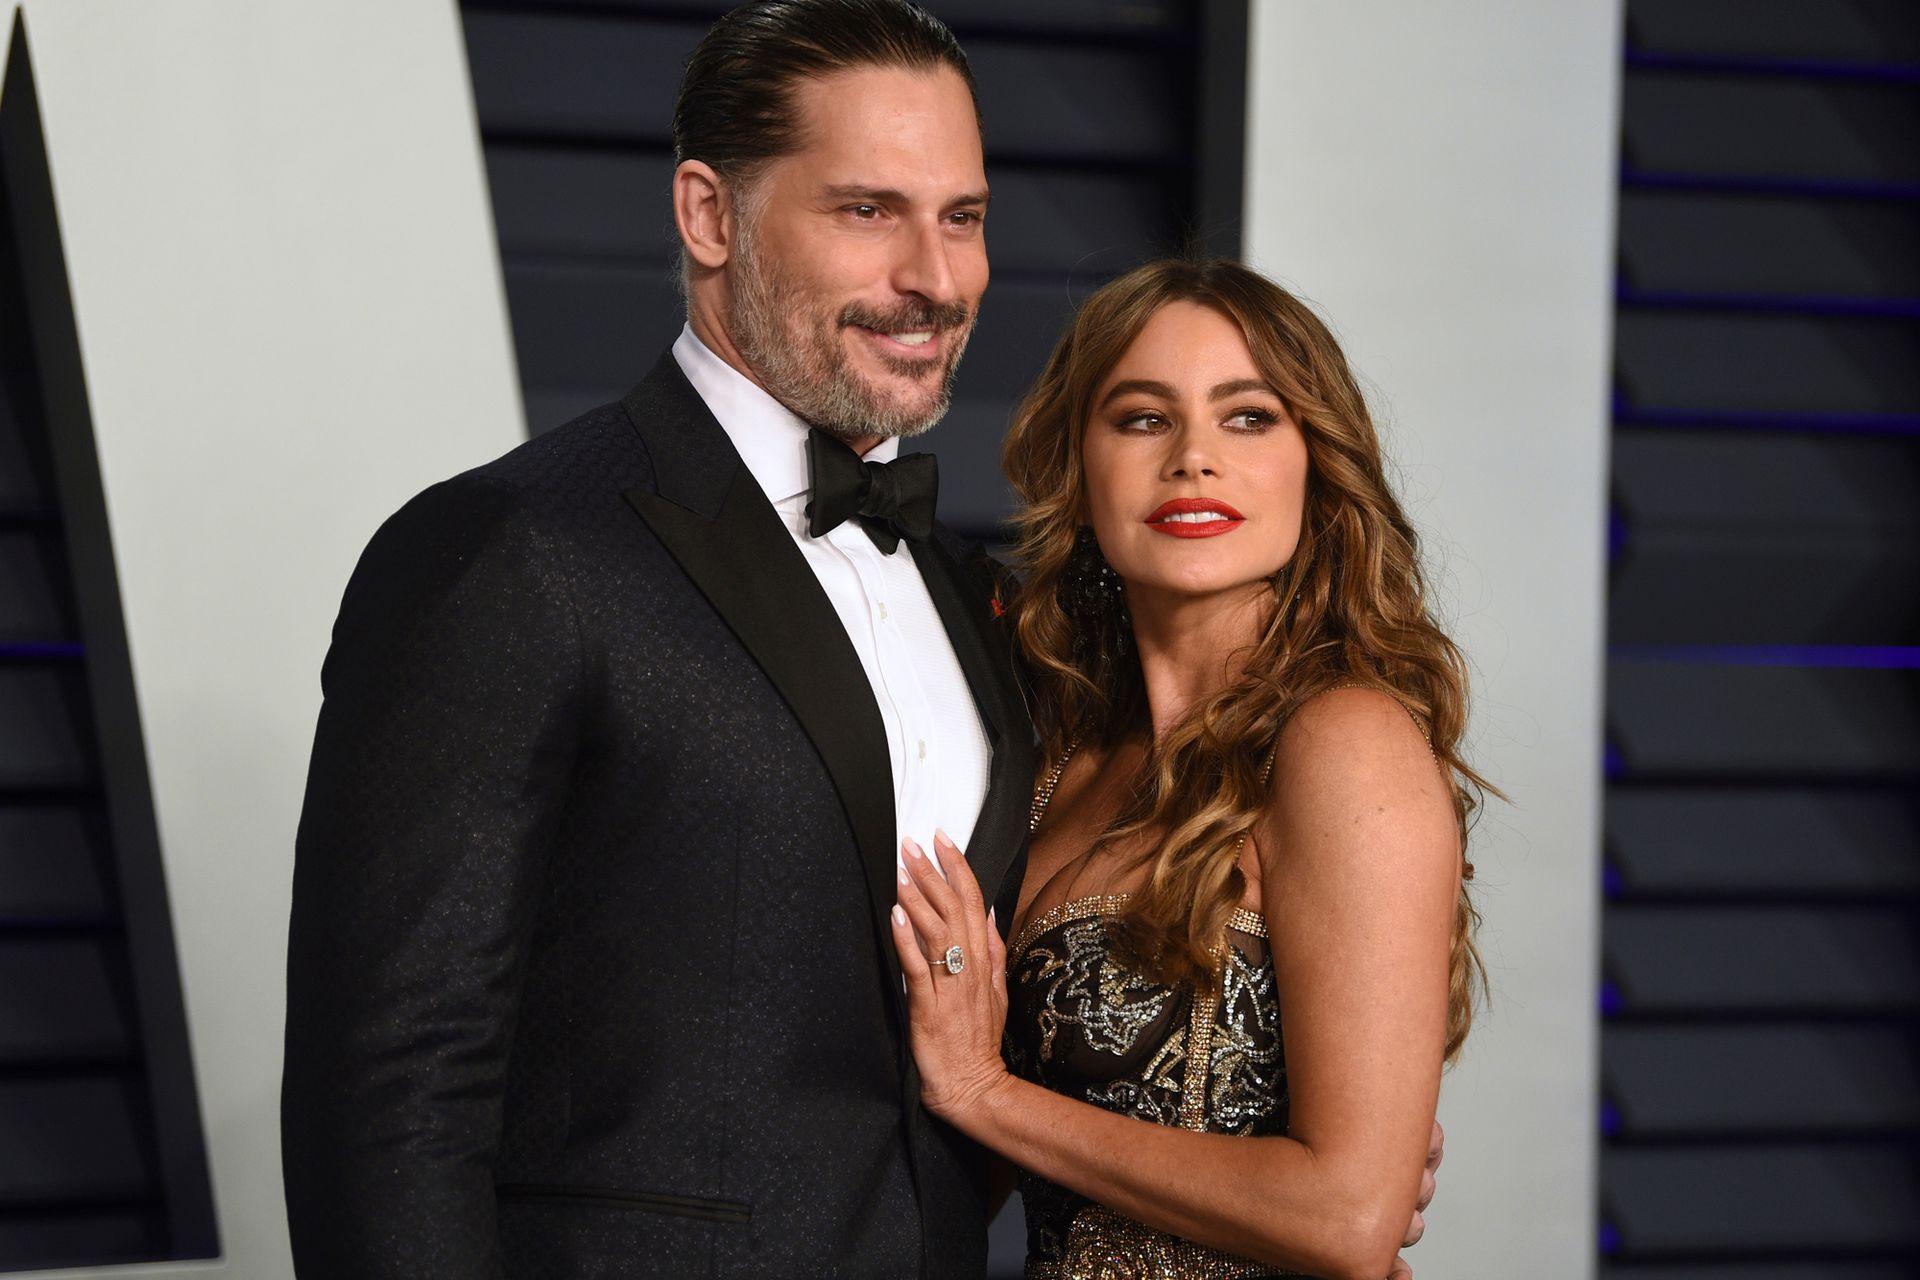 Joe Manganiello y Sofia Vergara se vistieron de gala para la fiesta de Vanity Fair